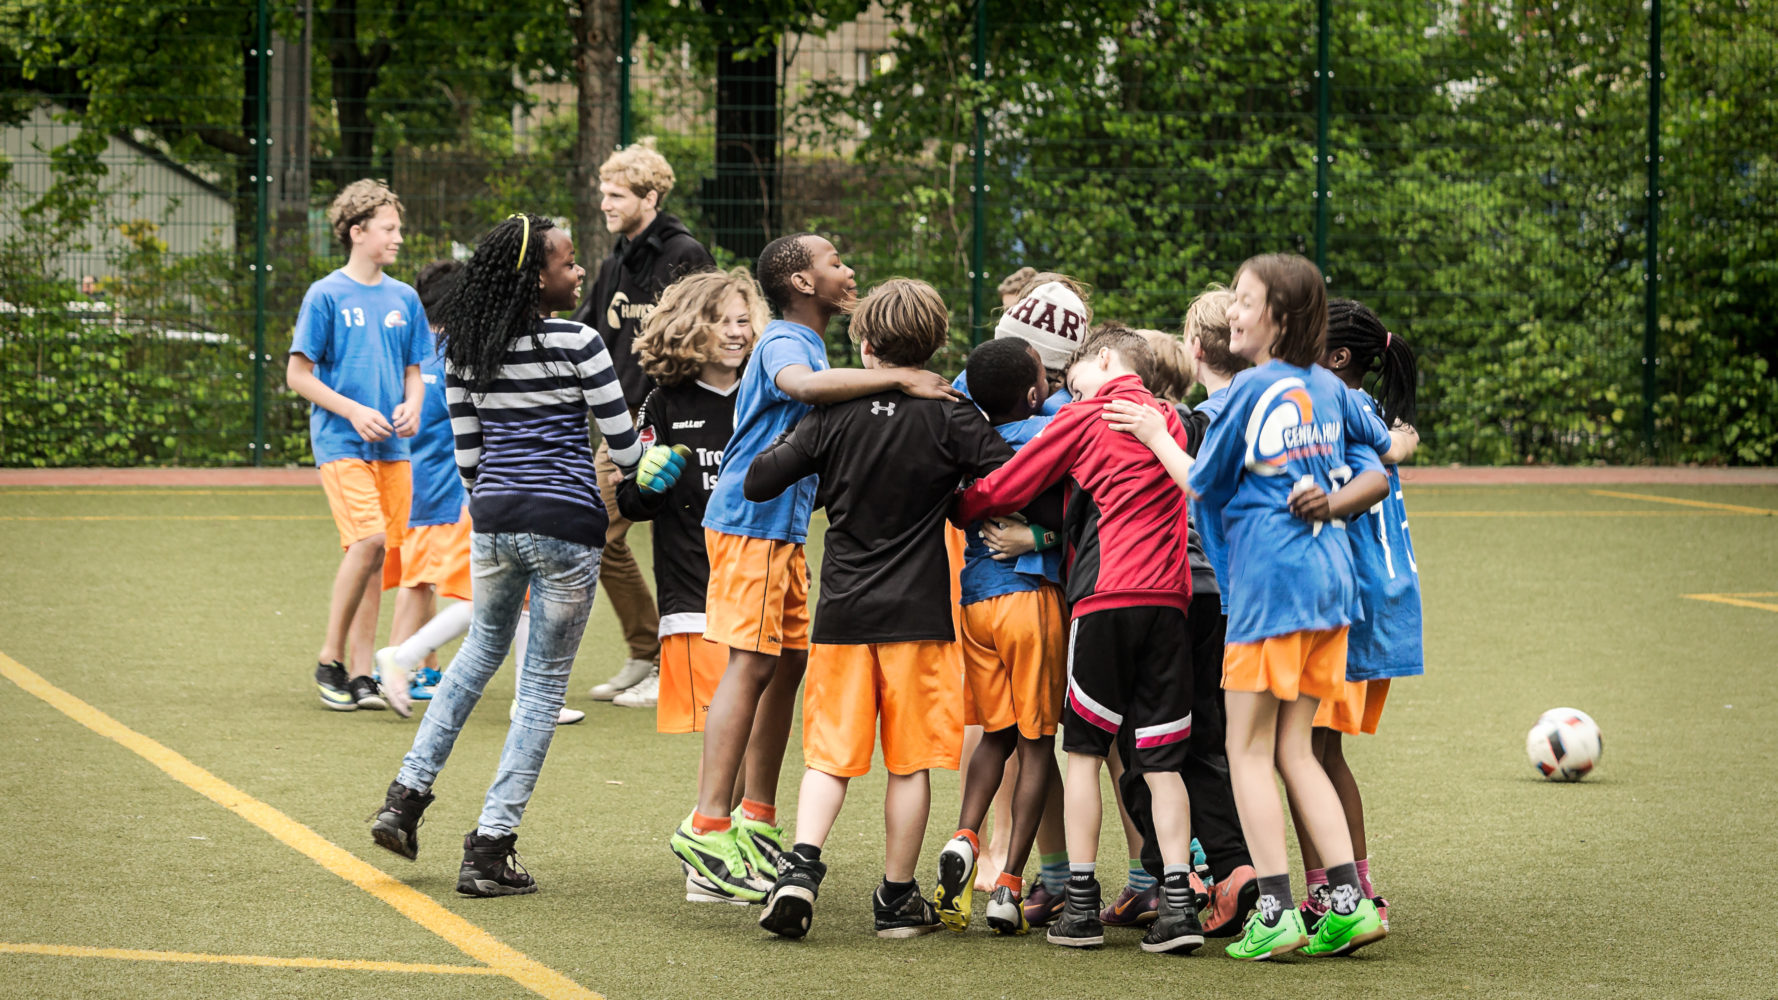 Soccer_U 13_Berlin cosmopolitan School